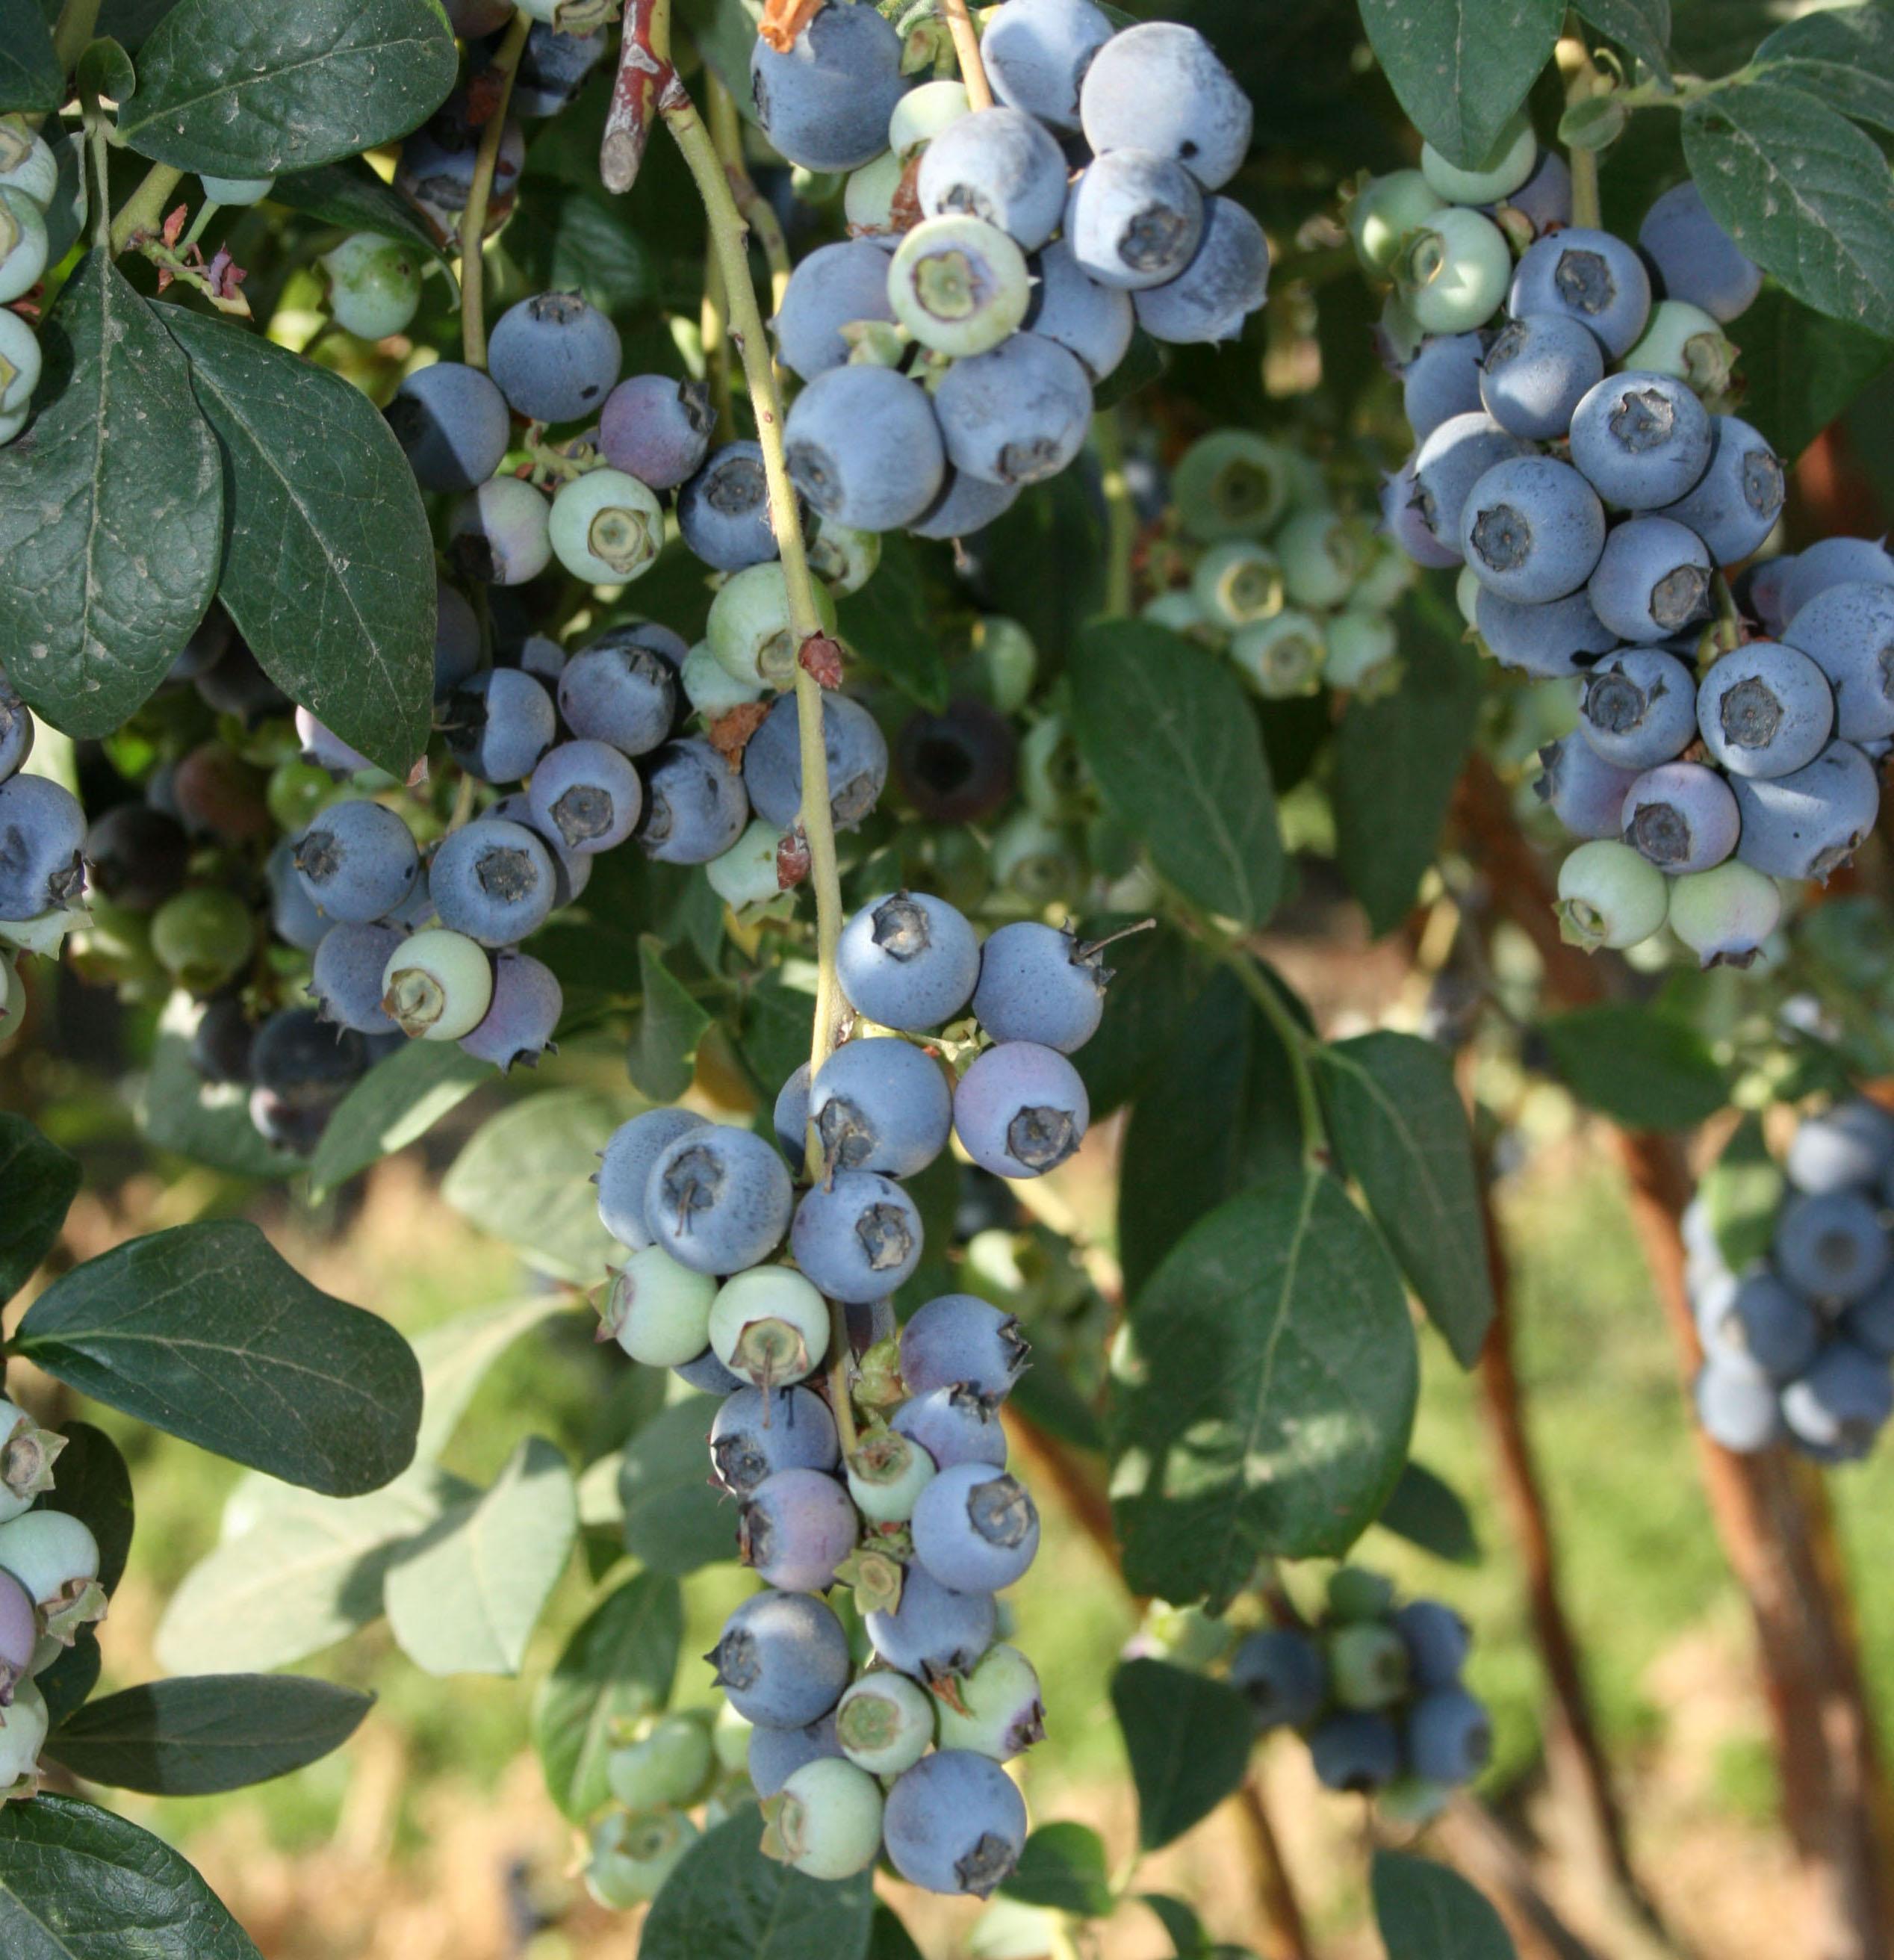 Christmas Tree Farm Southern California: New Prospective Farmers